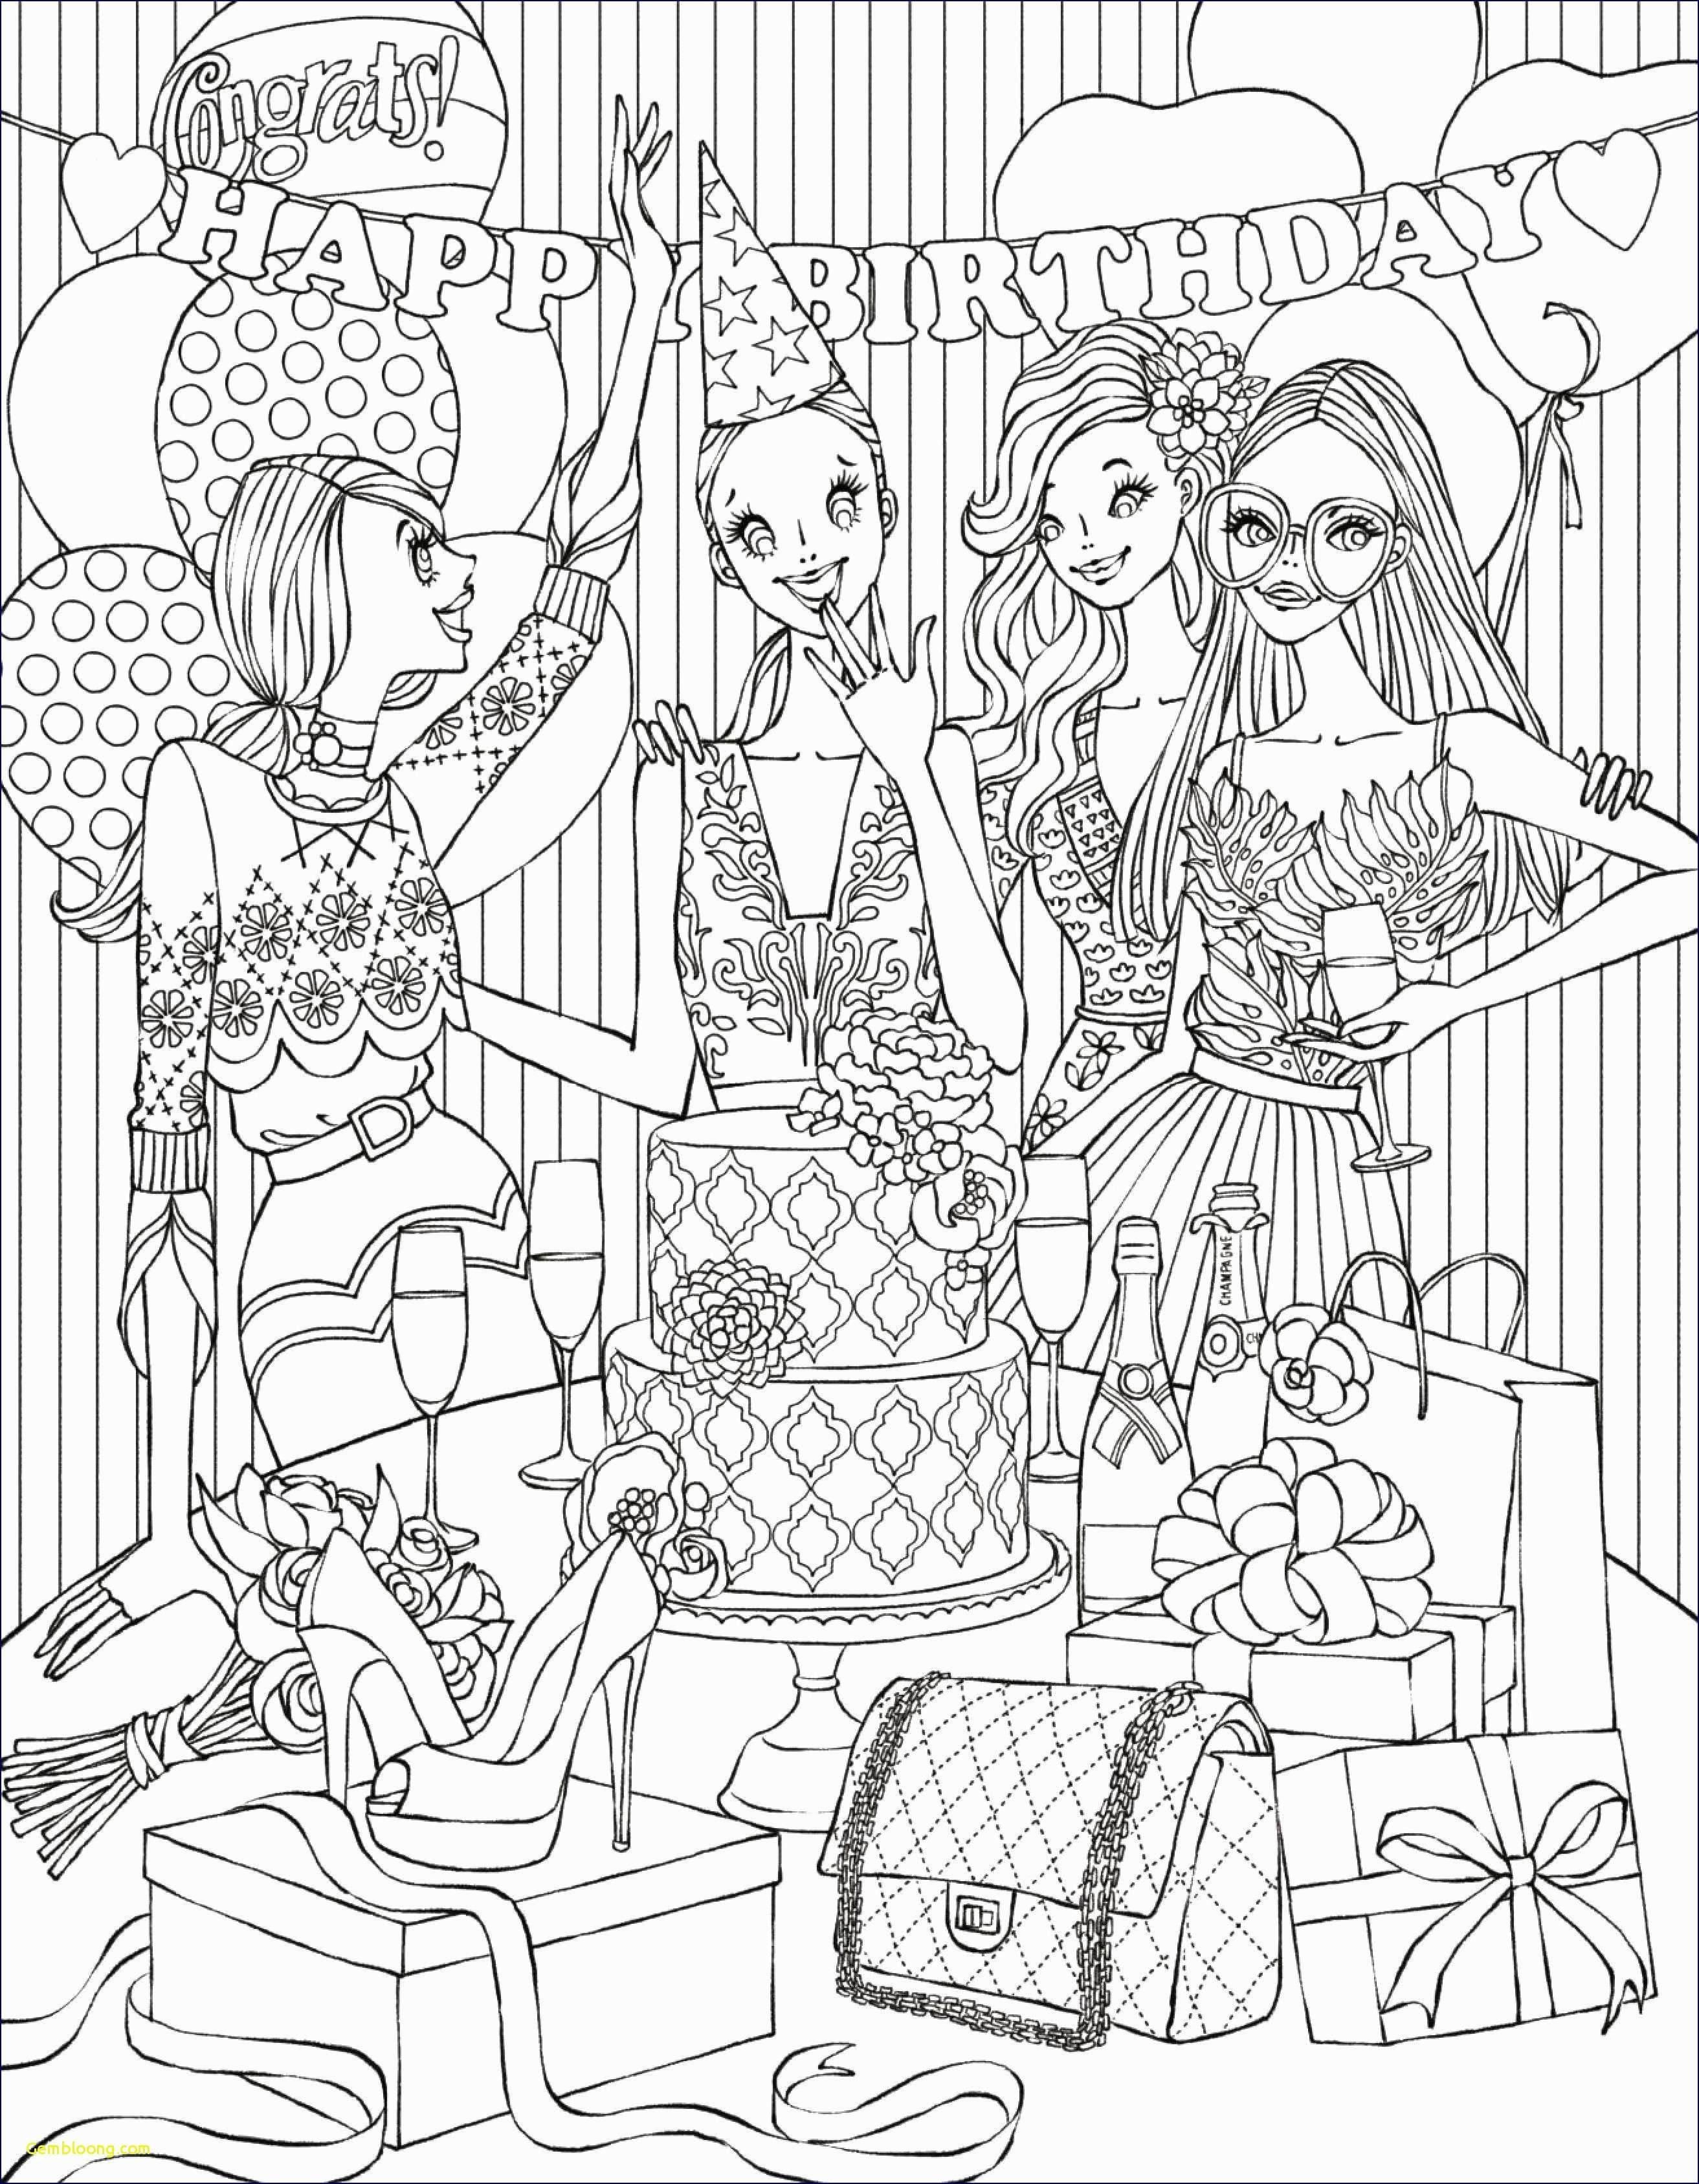 Disney Princess Ausmalbilder Genial 38 Disney Prinzessin Ausmalbilder Stock